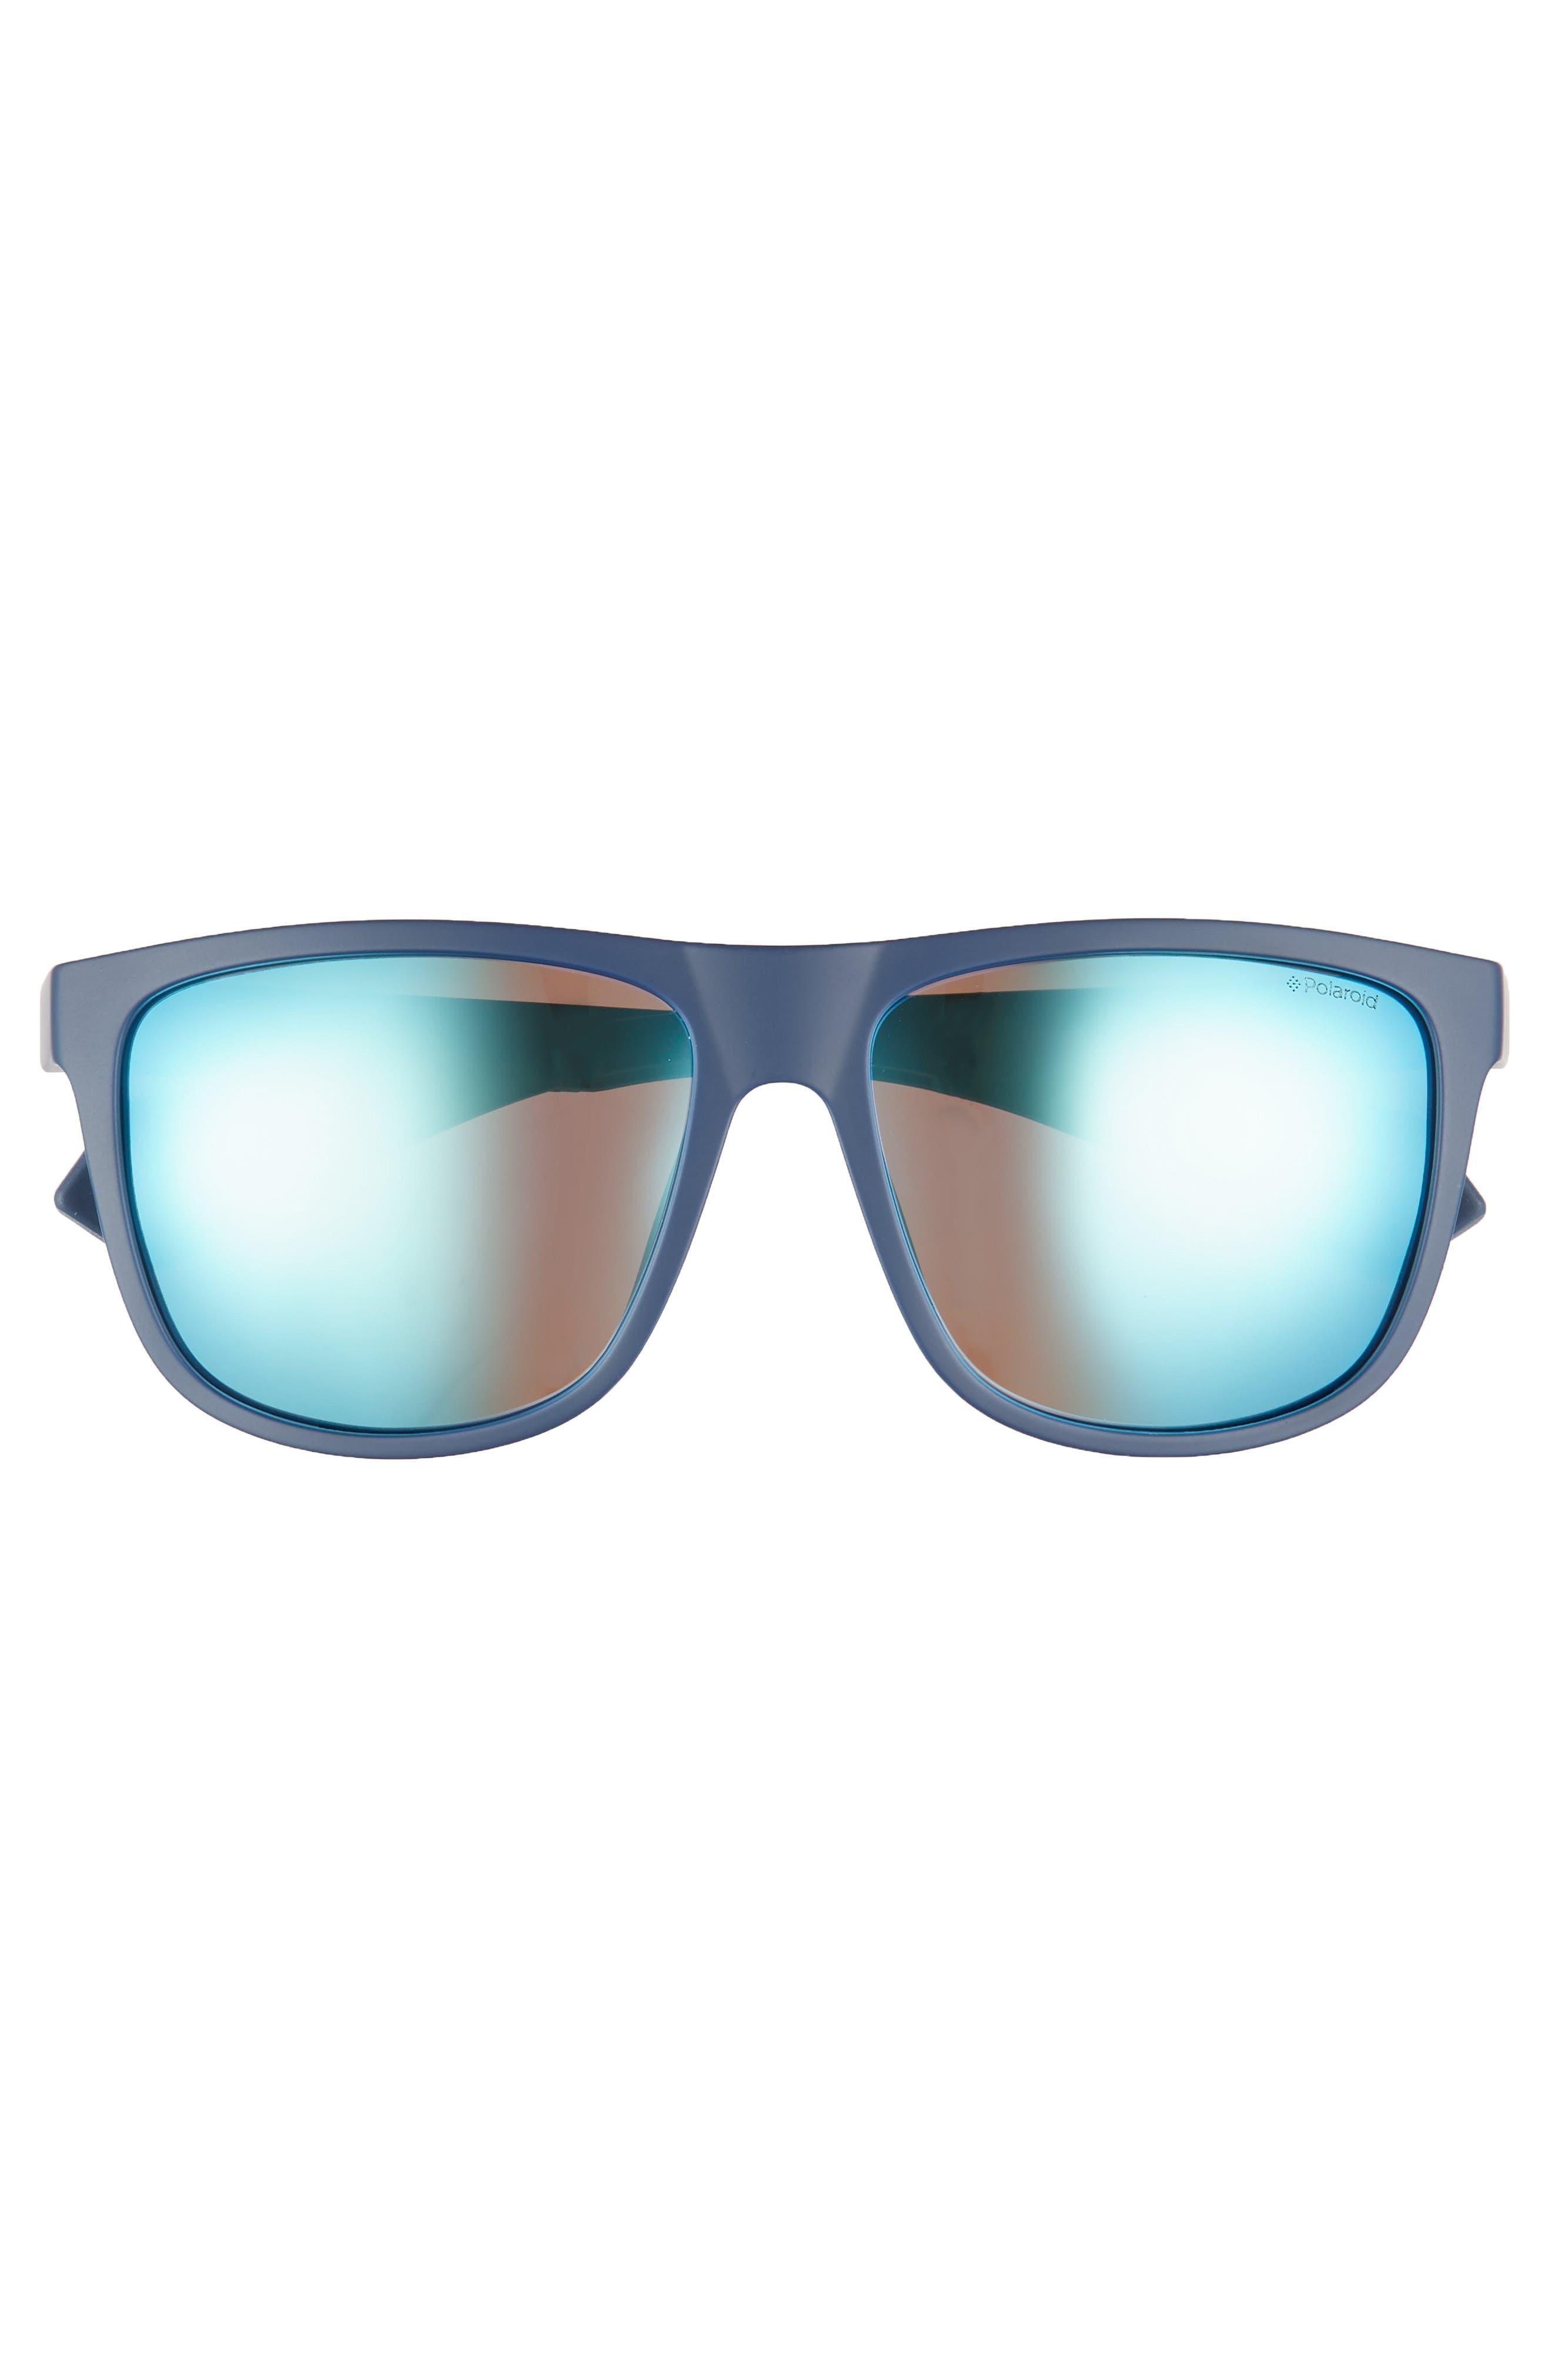 Plastic Core 57mm Polarized Sunglasses,                             Alternate thumbnail 2, color,                             BLUE